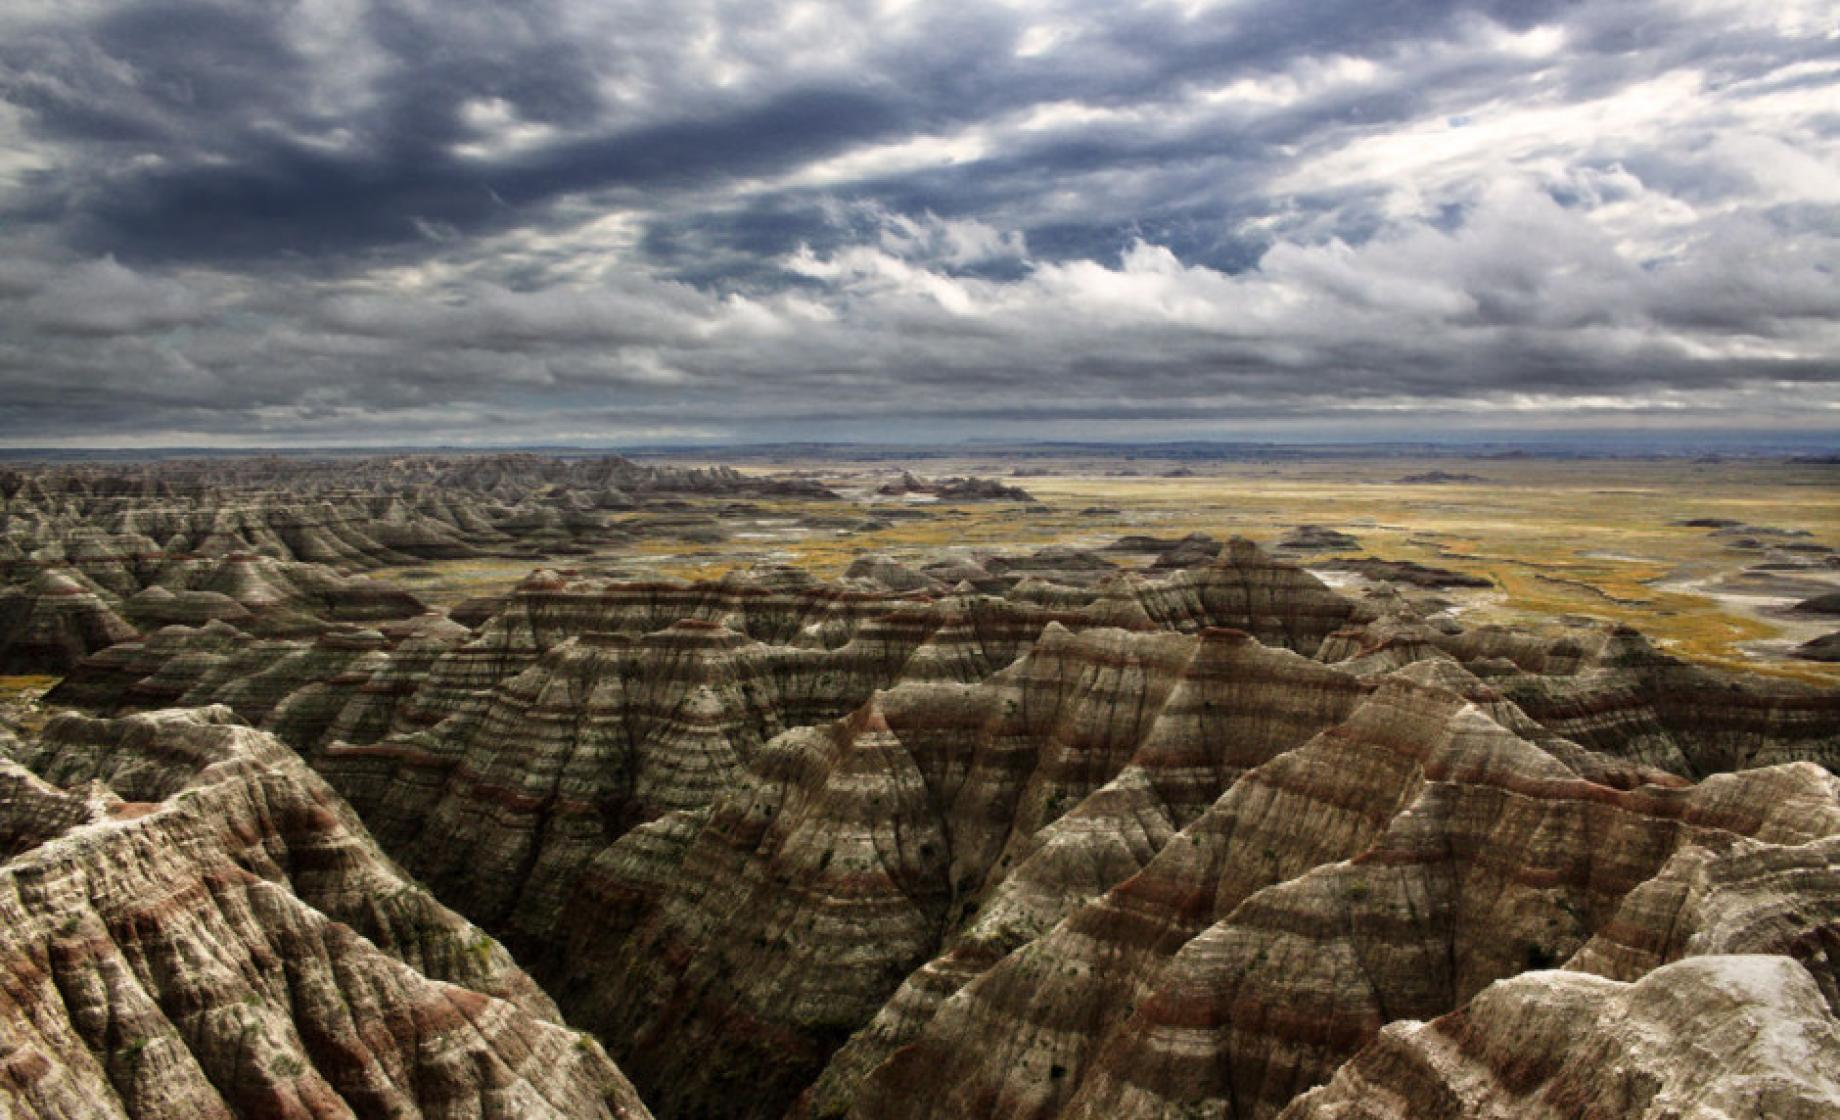 14 facts about South Dakota's Black Hills & Badlands that